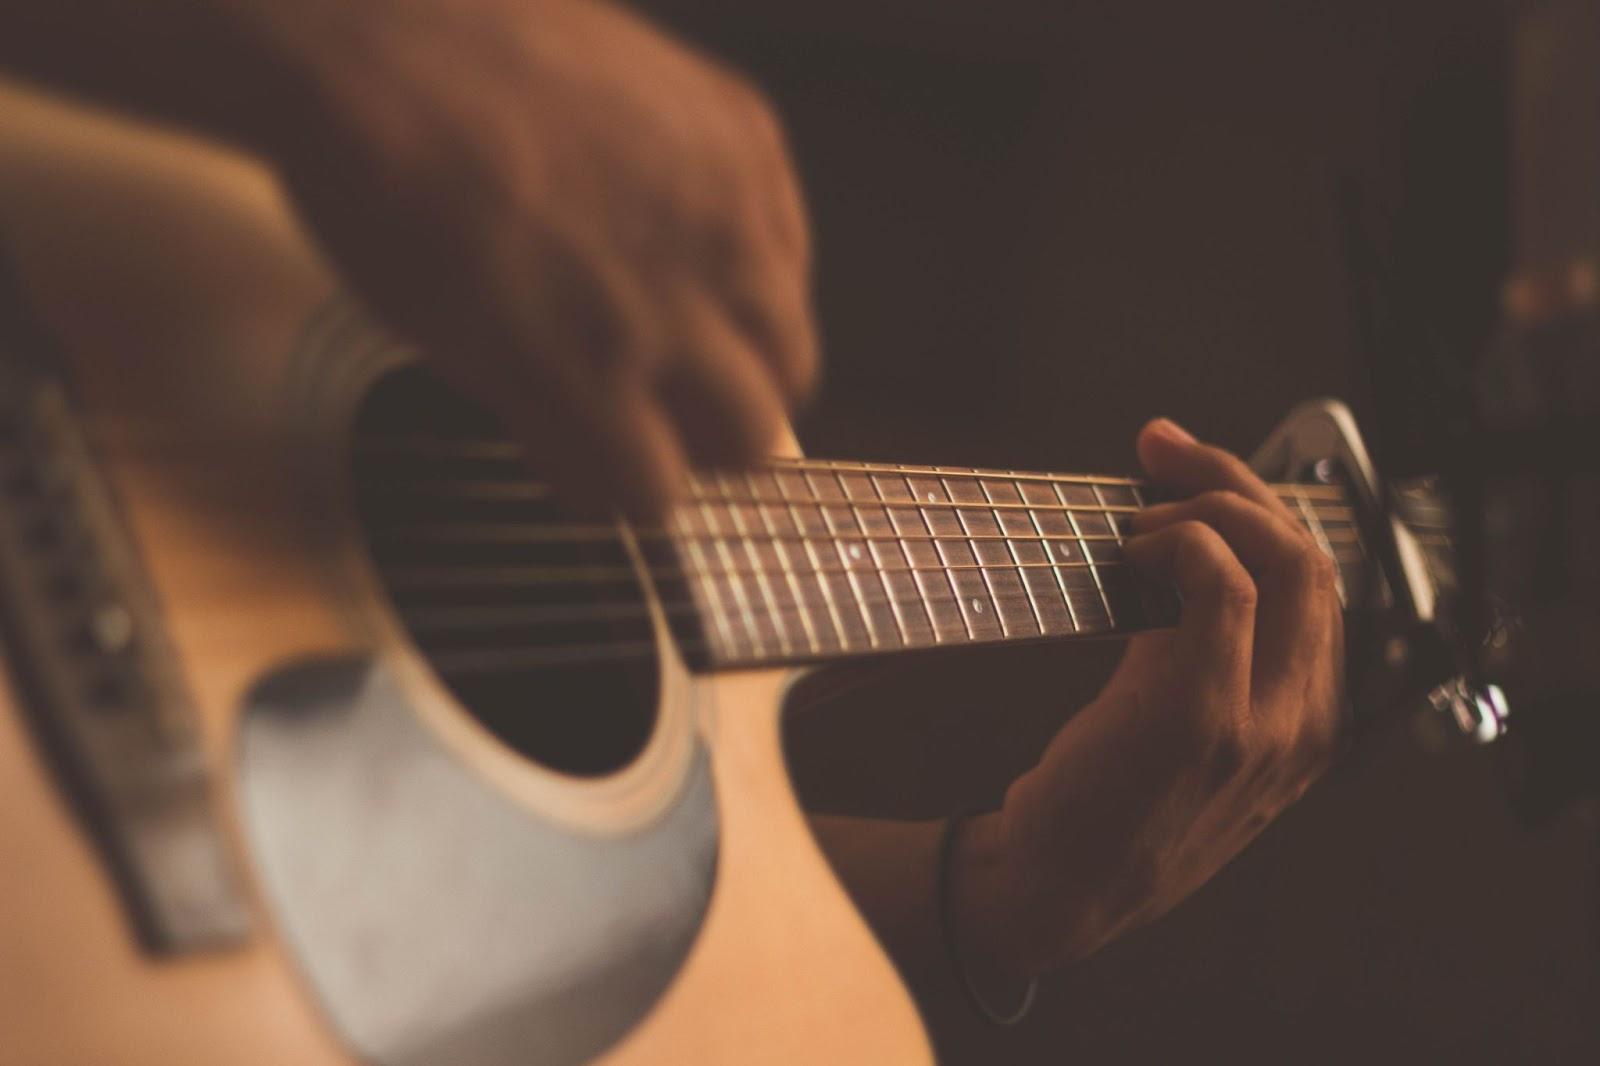 start with lyrics or music